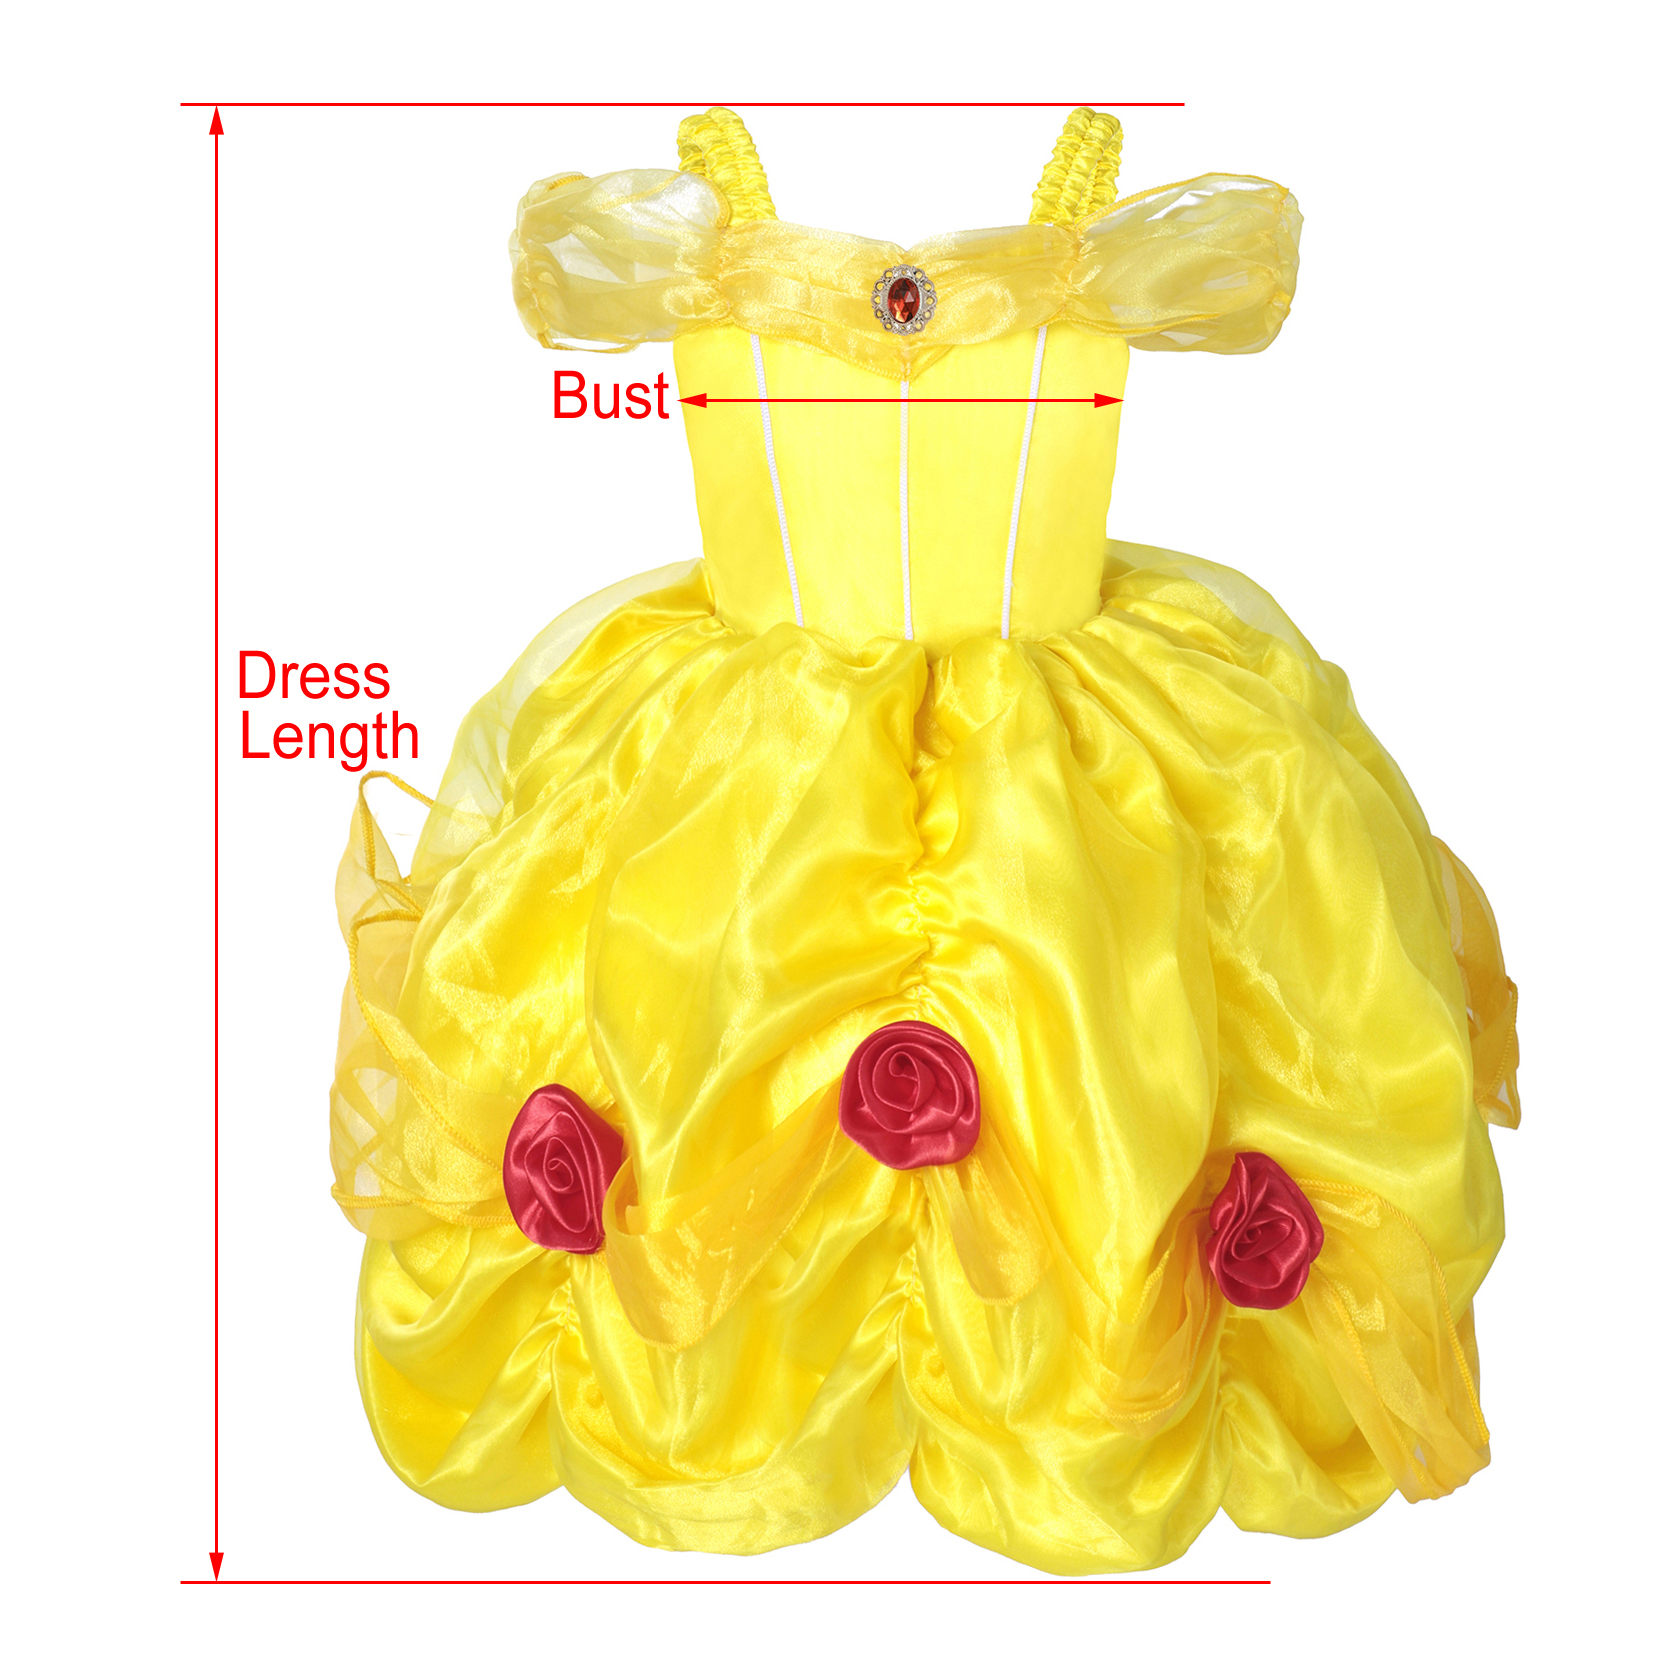 Princess Belle Dress Off Shoulder Layered Ruffle Costume Dress for Little Girls